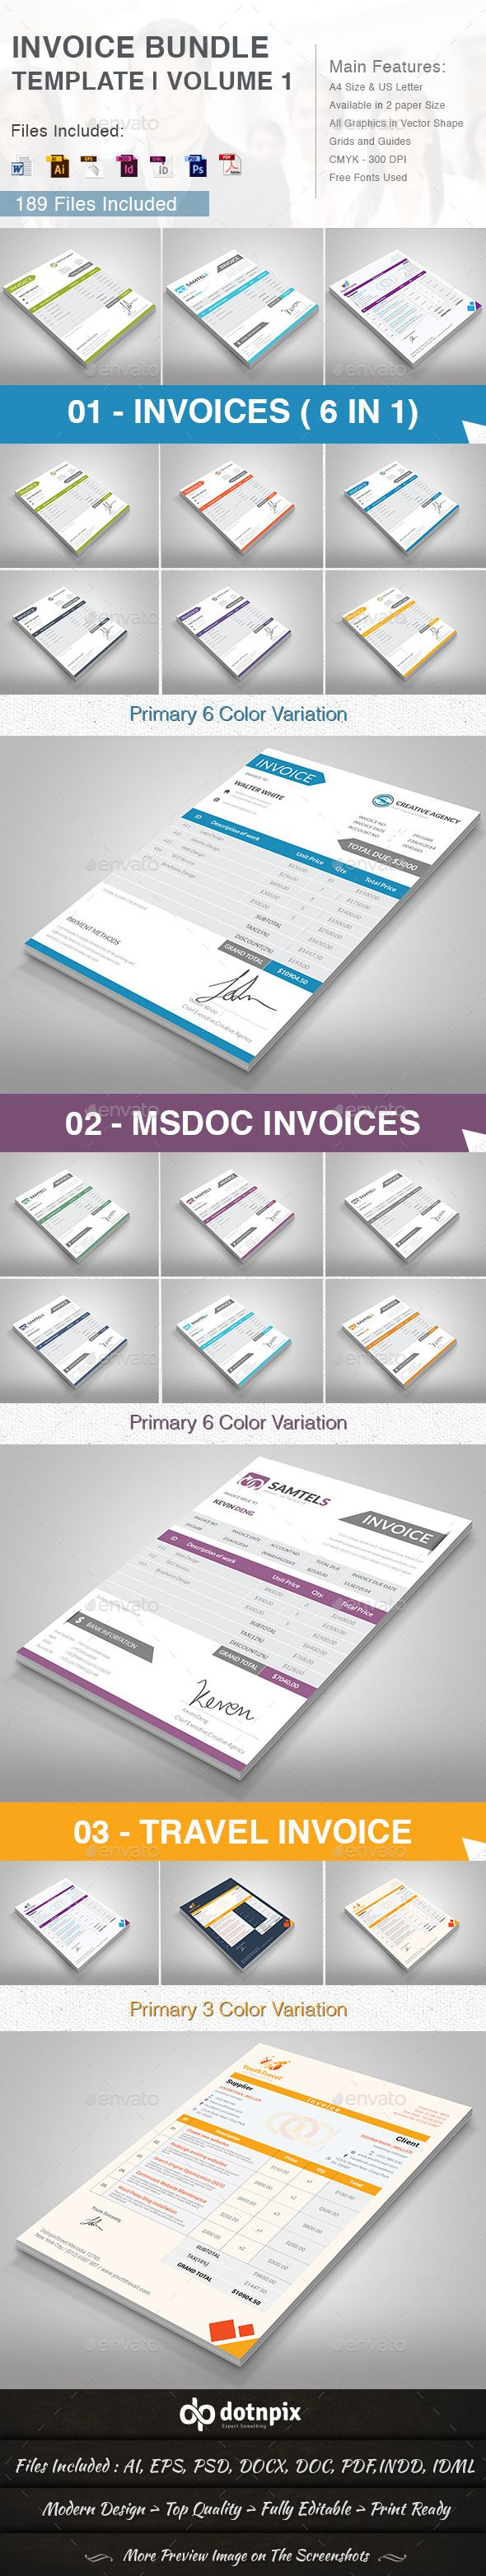 Invoice Bundle Template Volume 1 Bundle Warehouse Pinterest